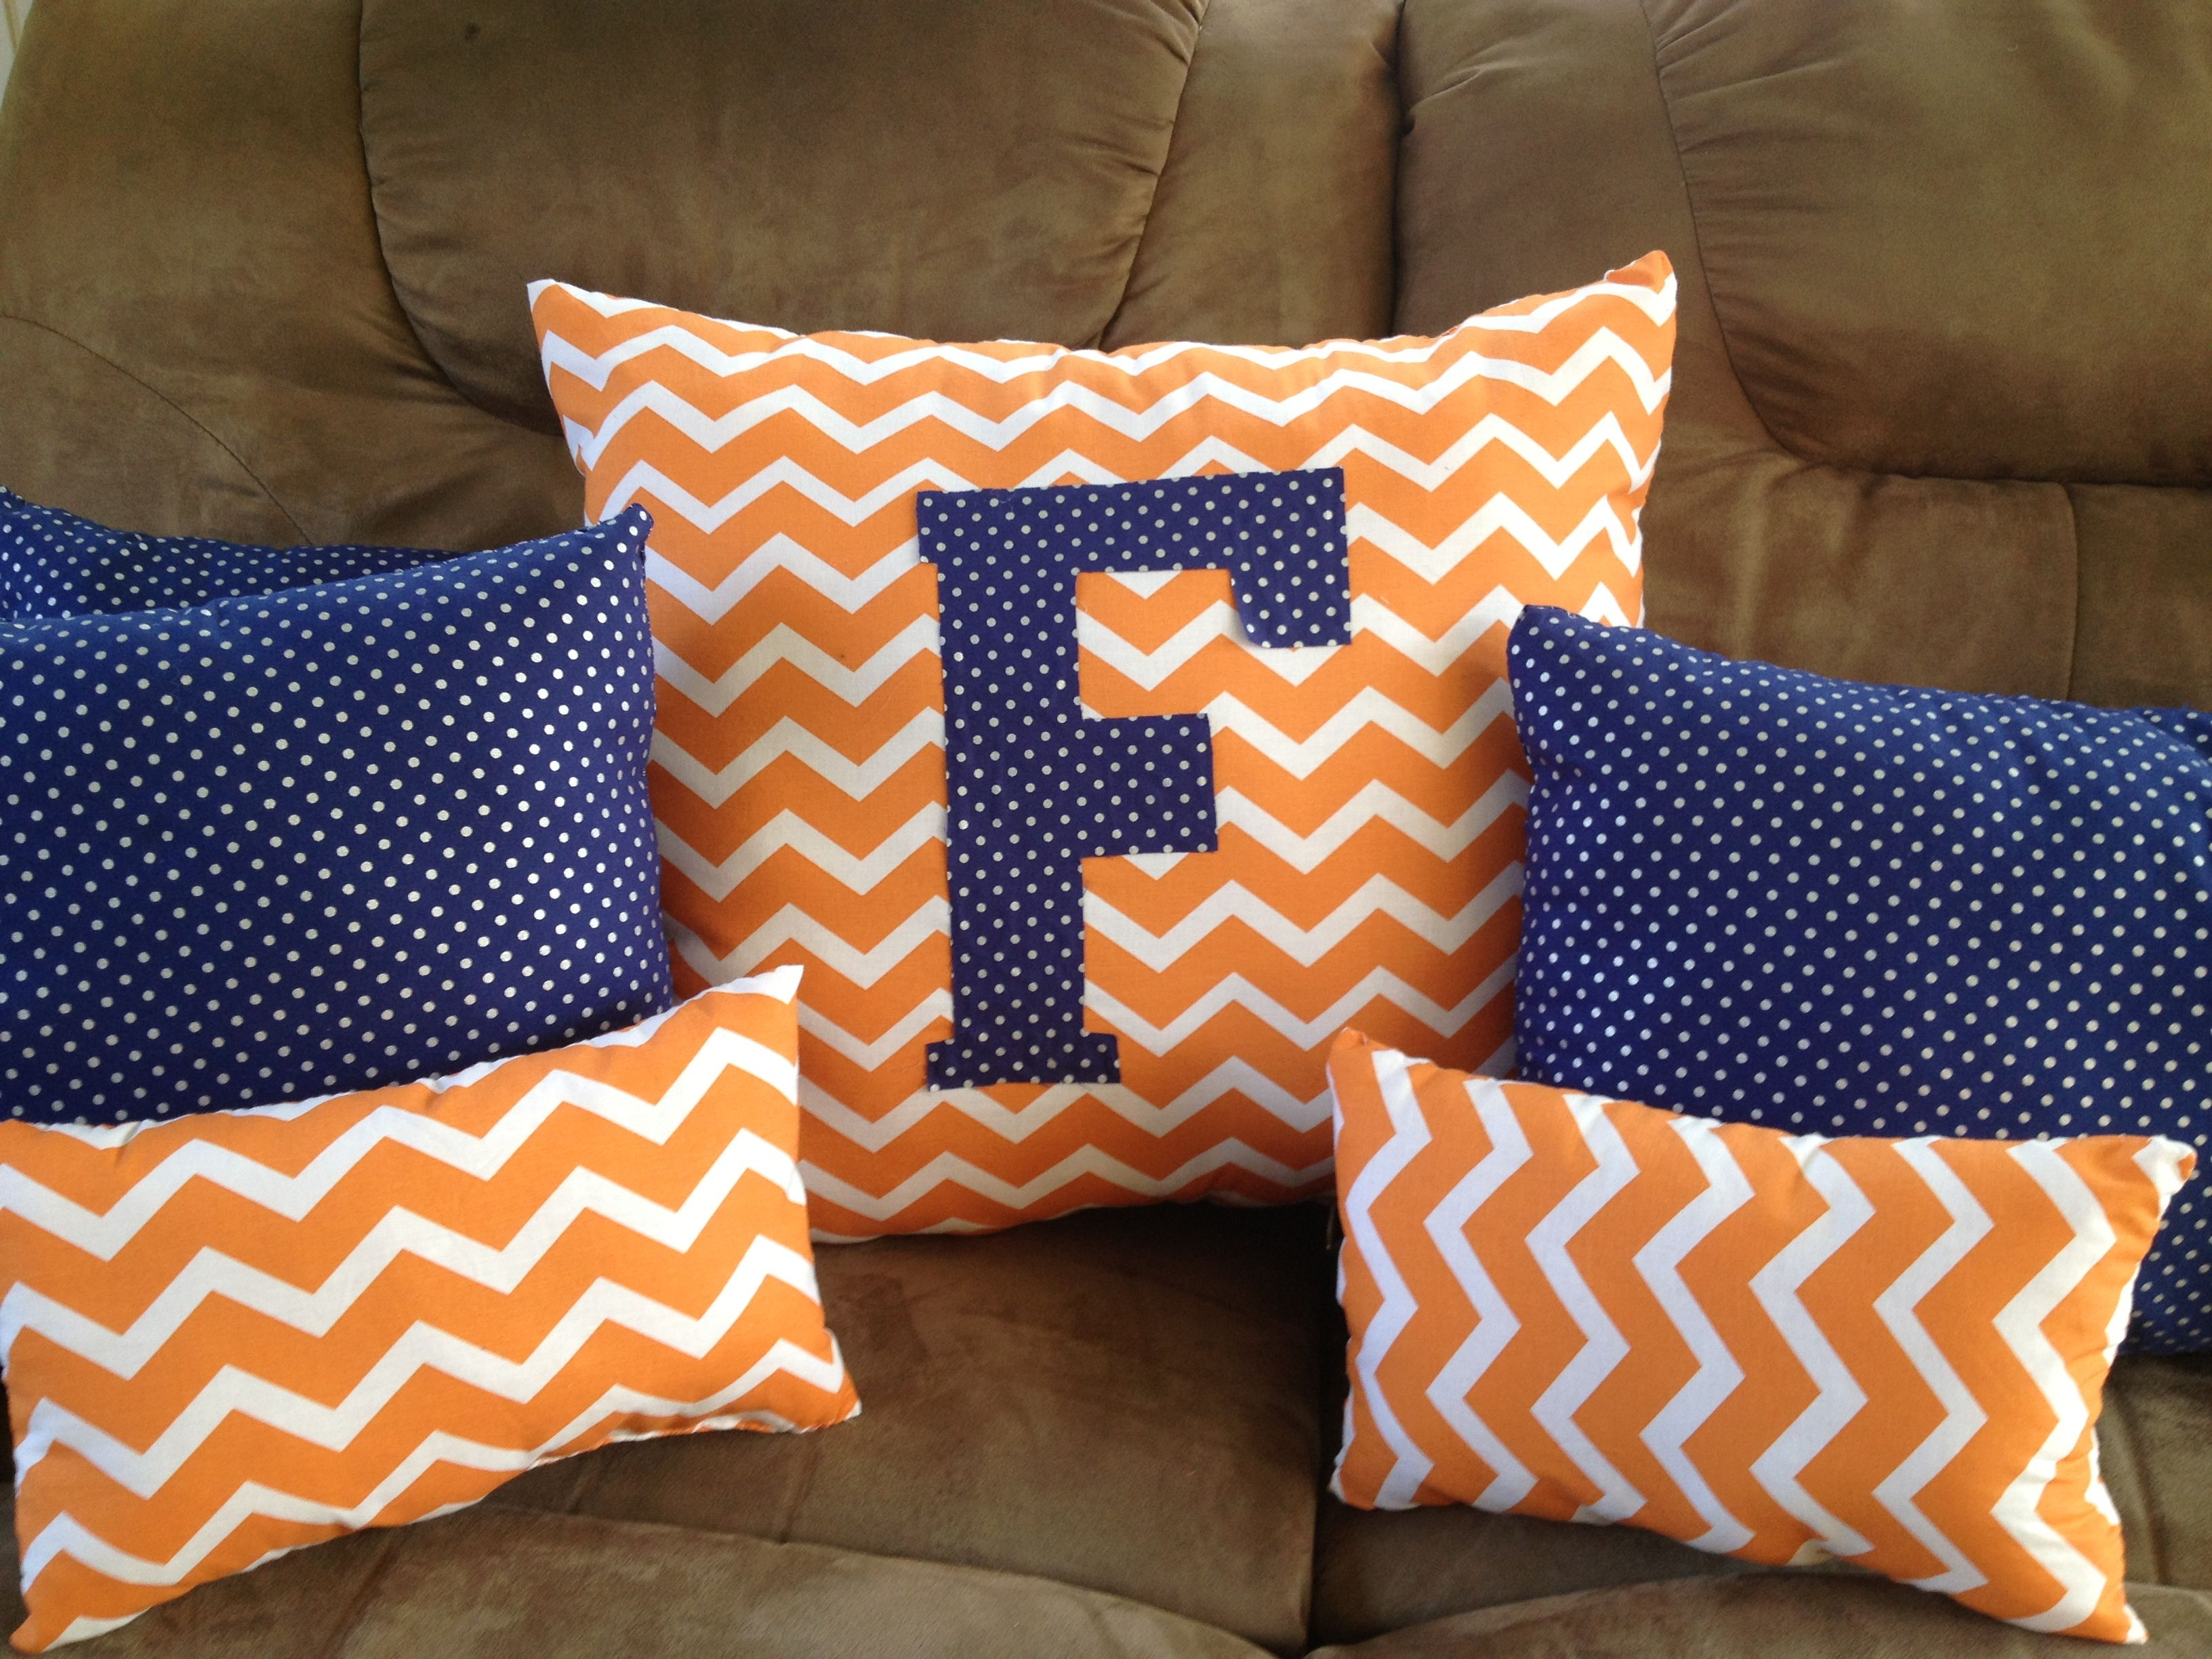 Florida Gator Pillows Made Them Last Night.